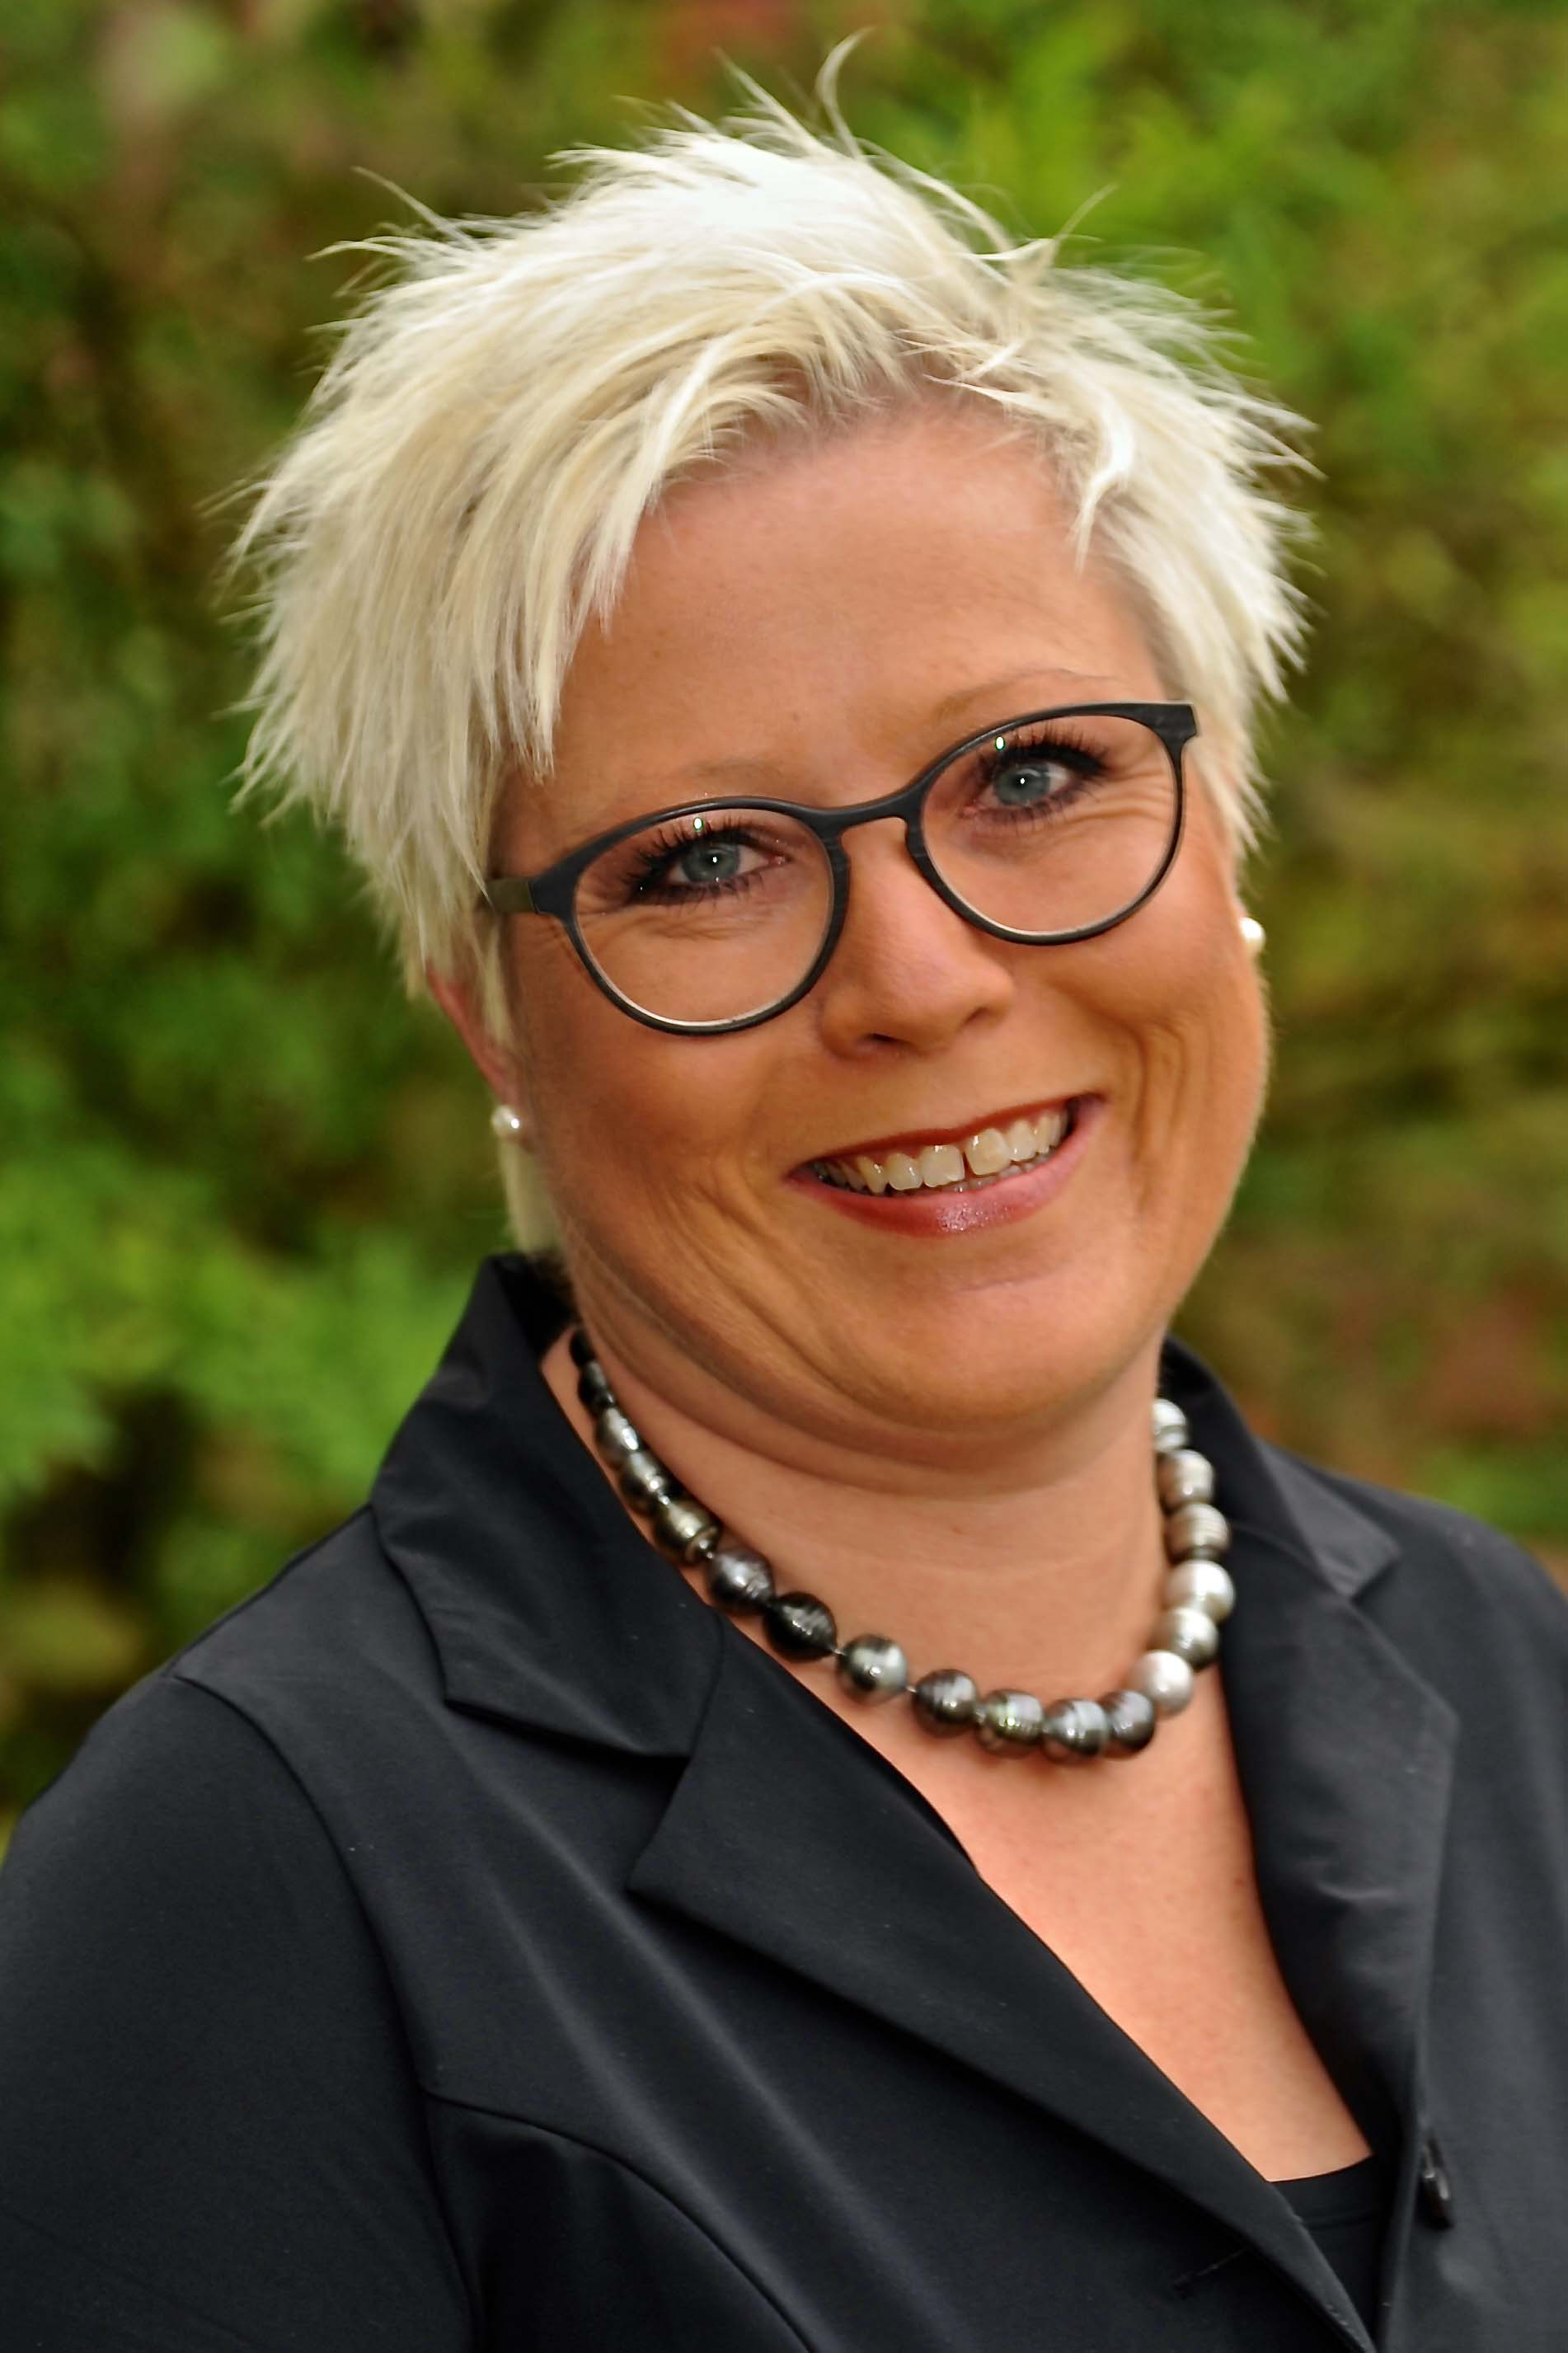 Tanja Murri